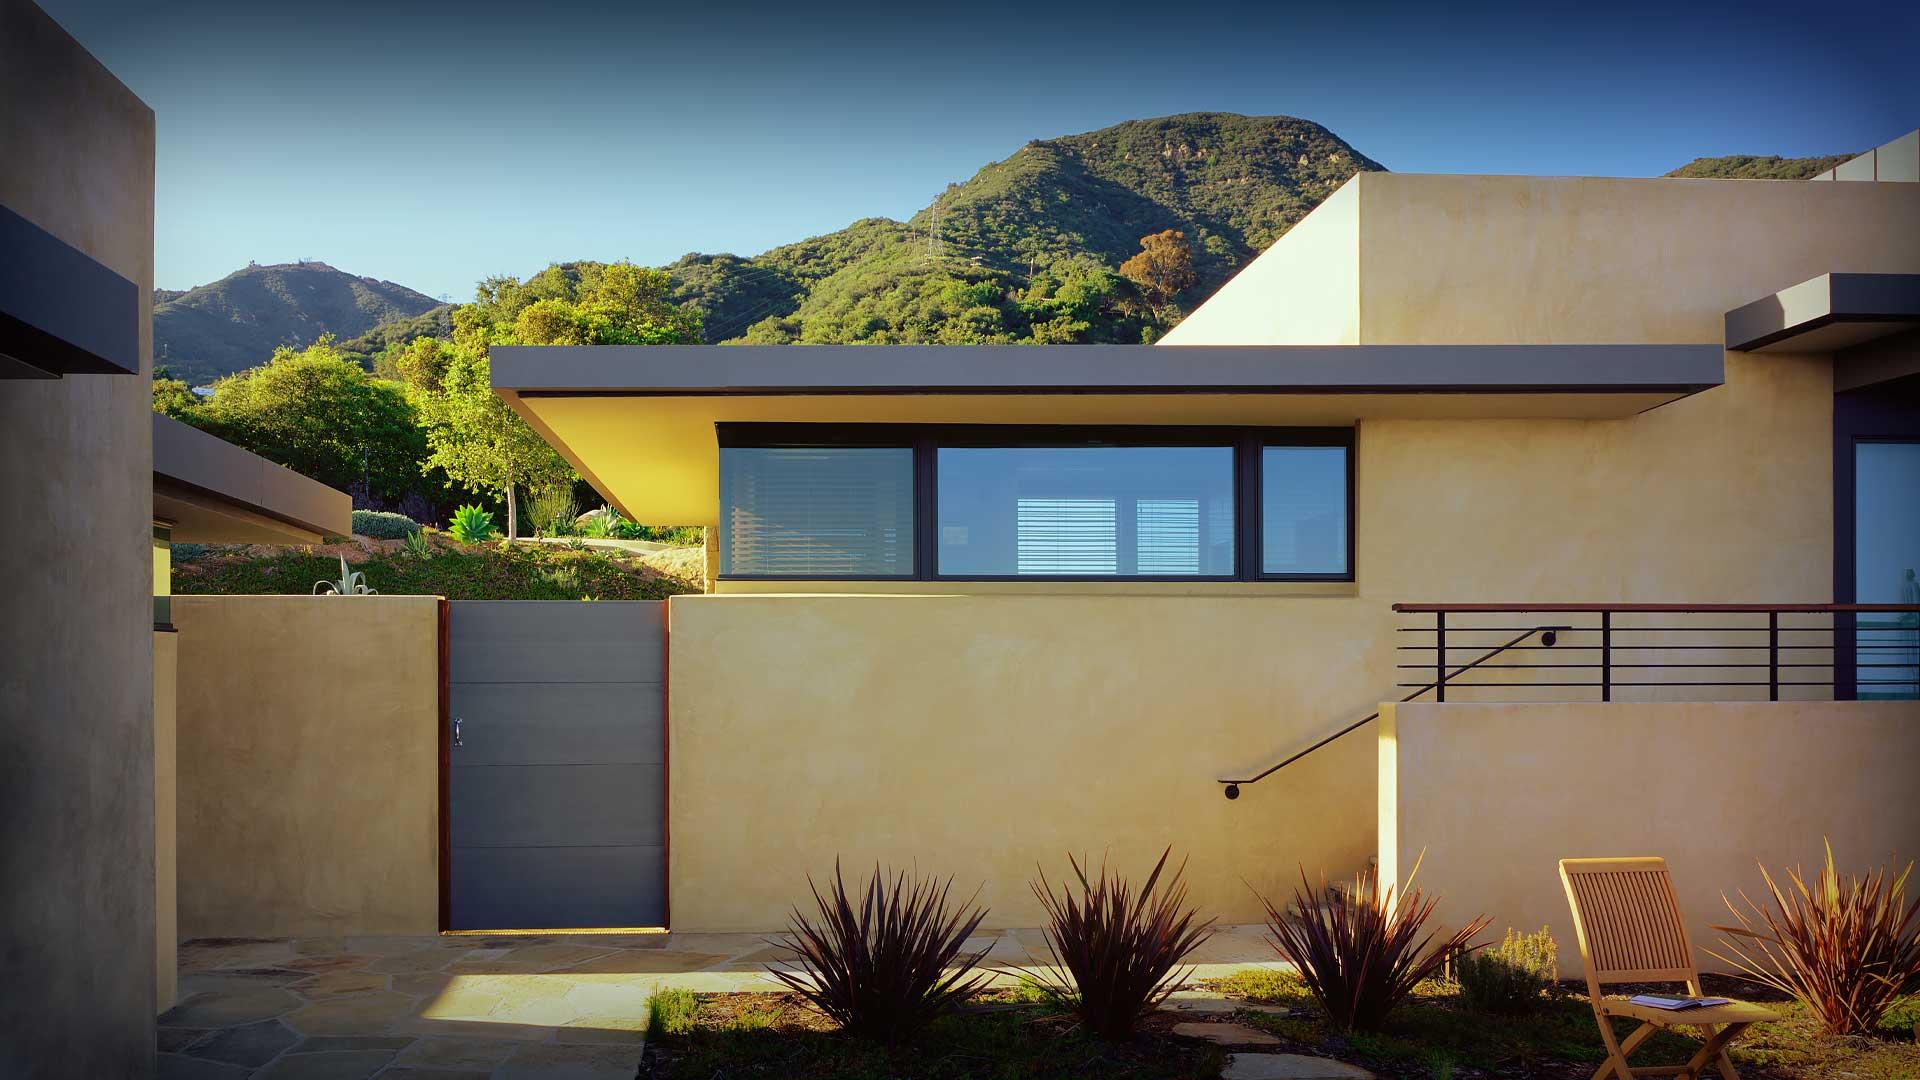 davis-residence-1920×1080-08a